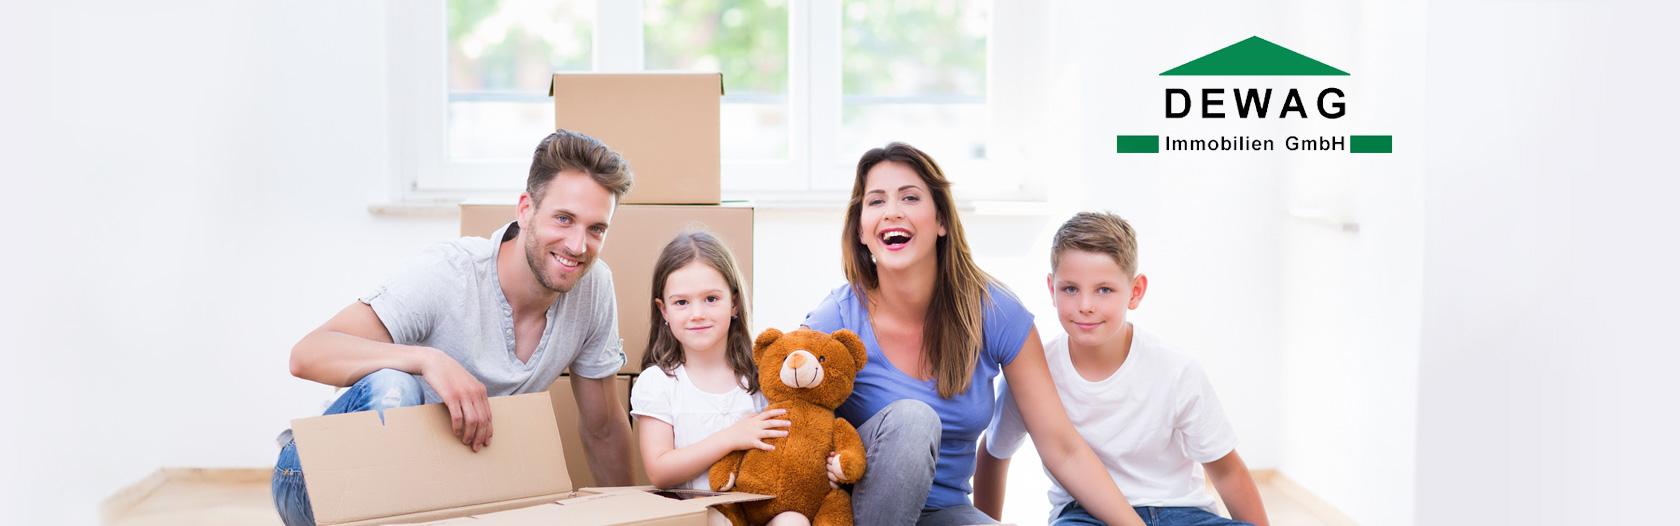 DEWAG Immobilien GmbH